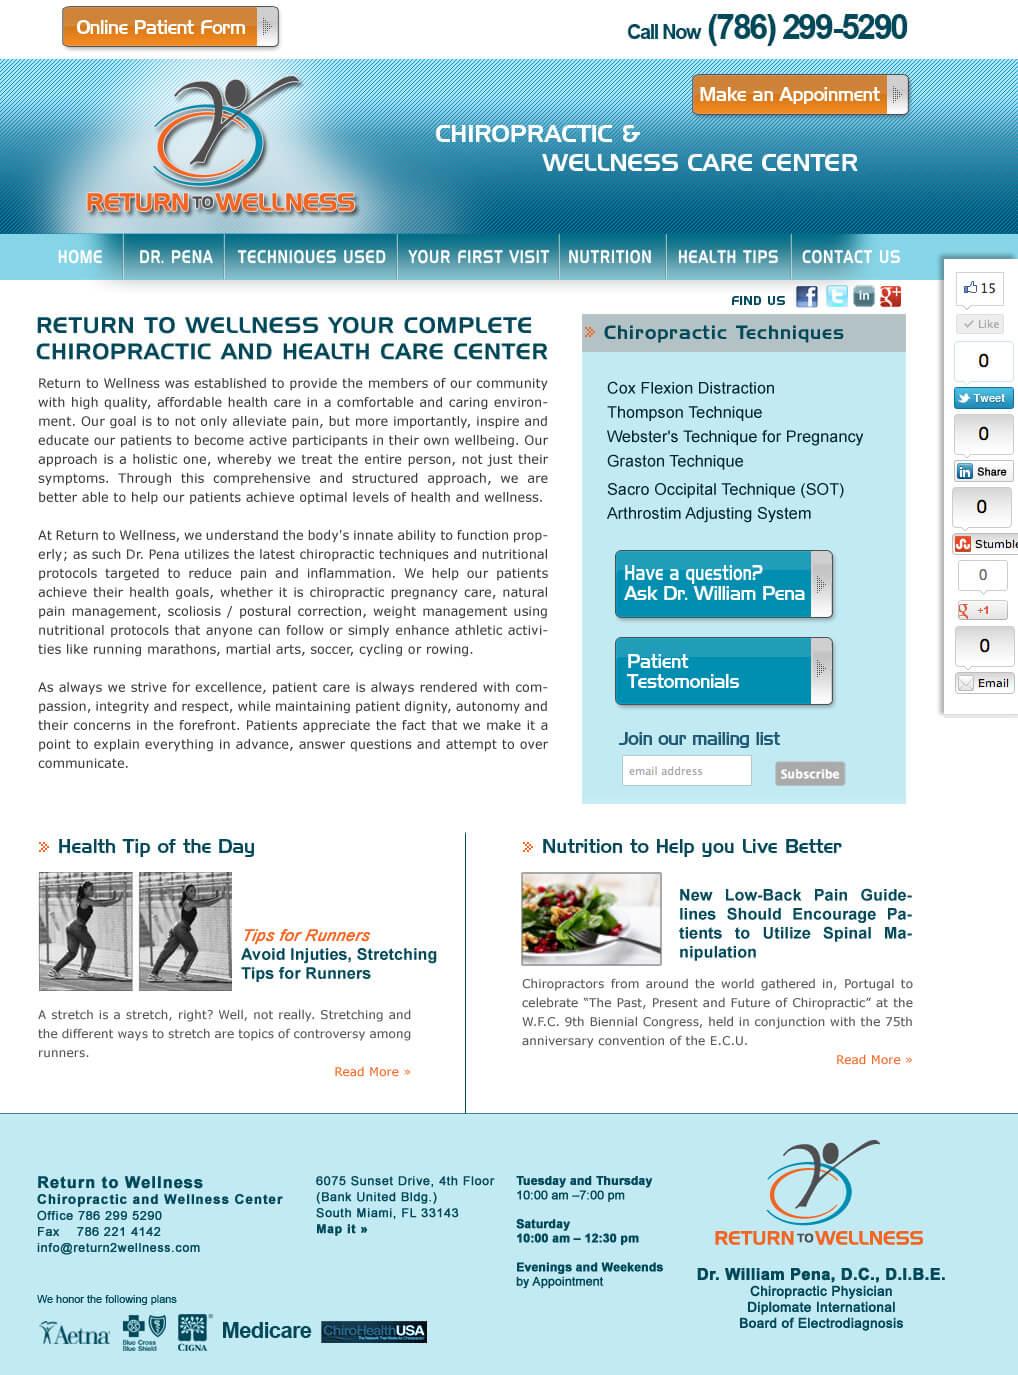 Chiropractor-Web-Site-Design-Miami